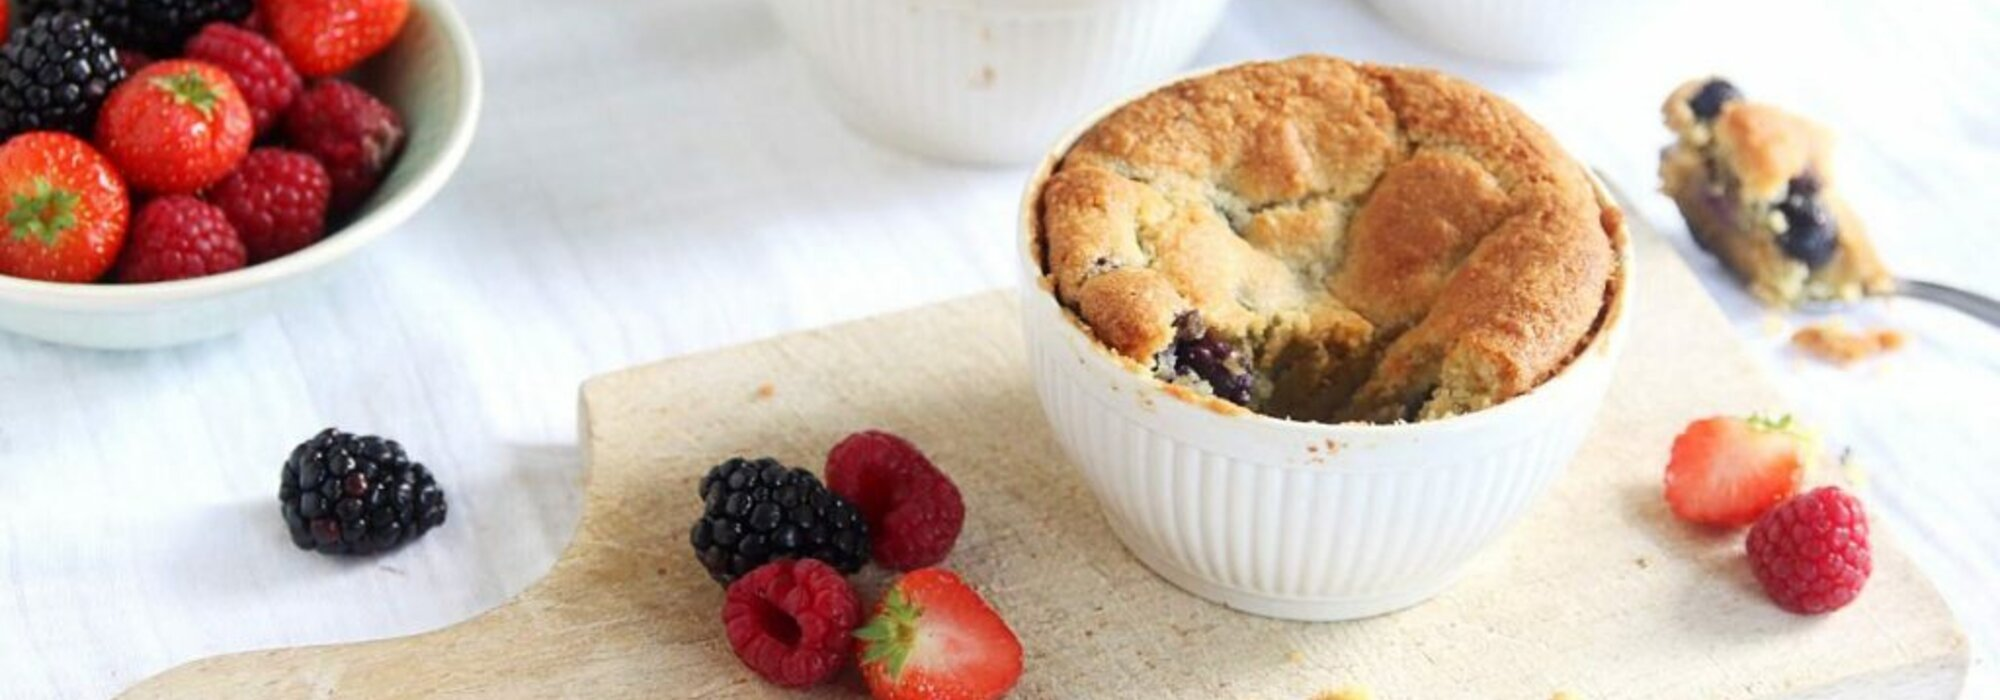 Koolhydraatarme bosbessen muffins